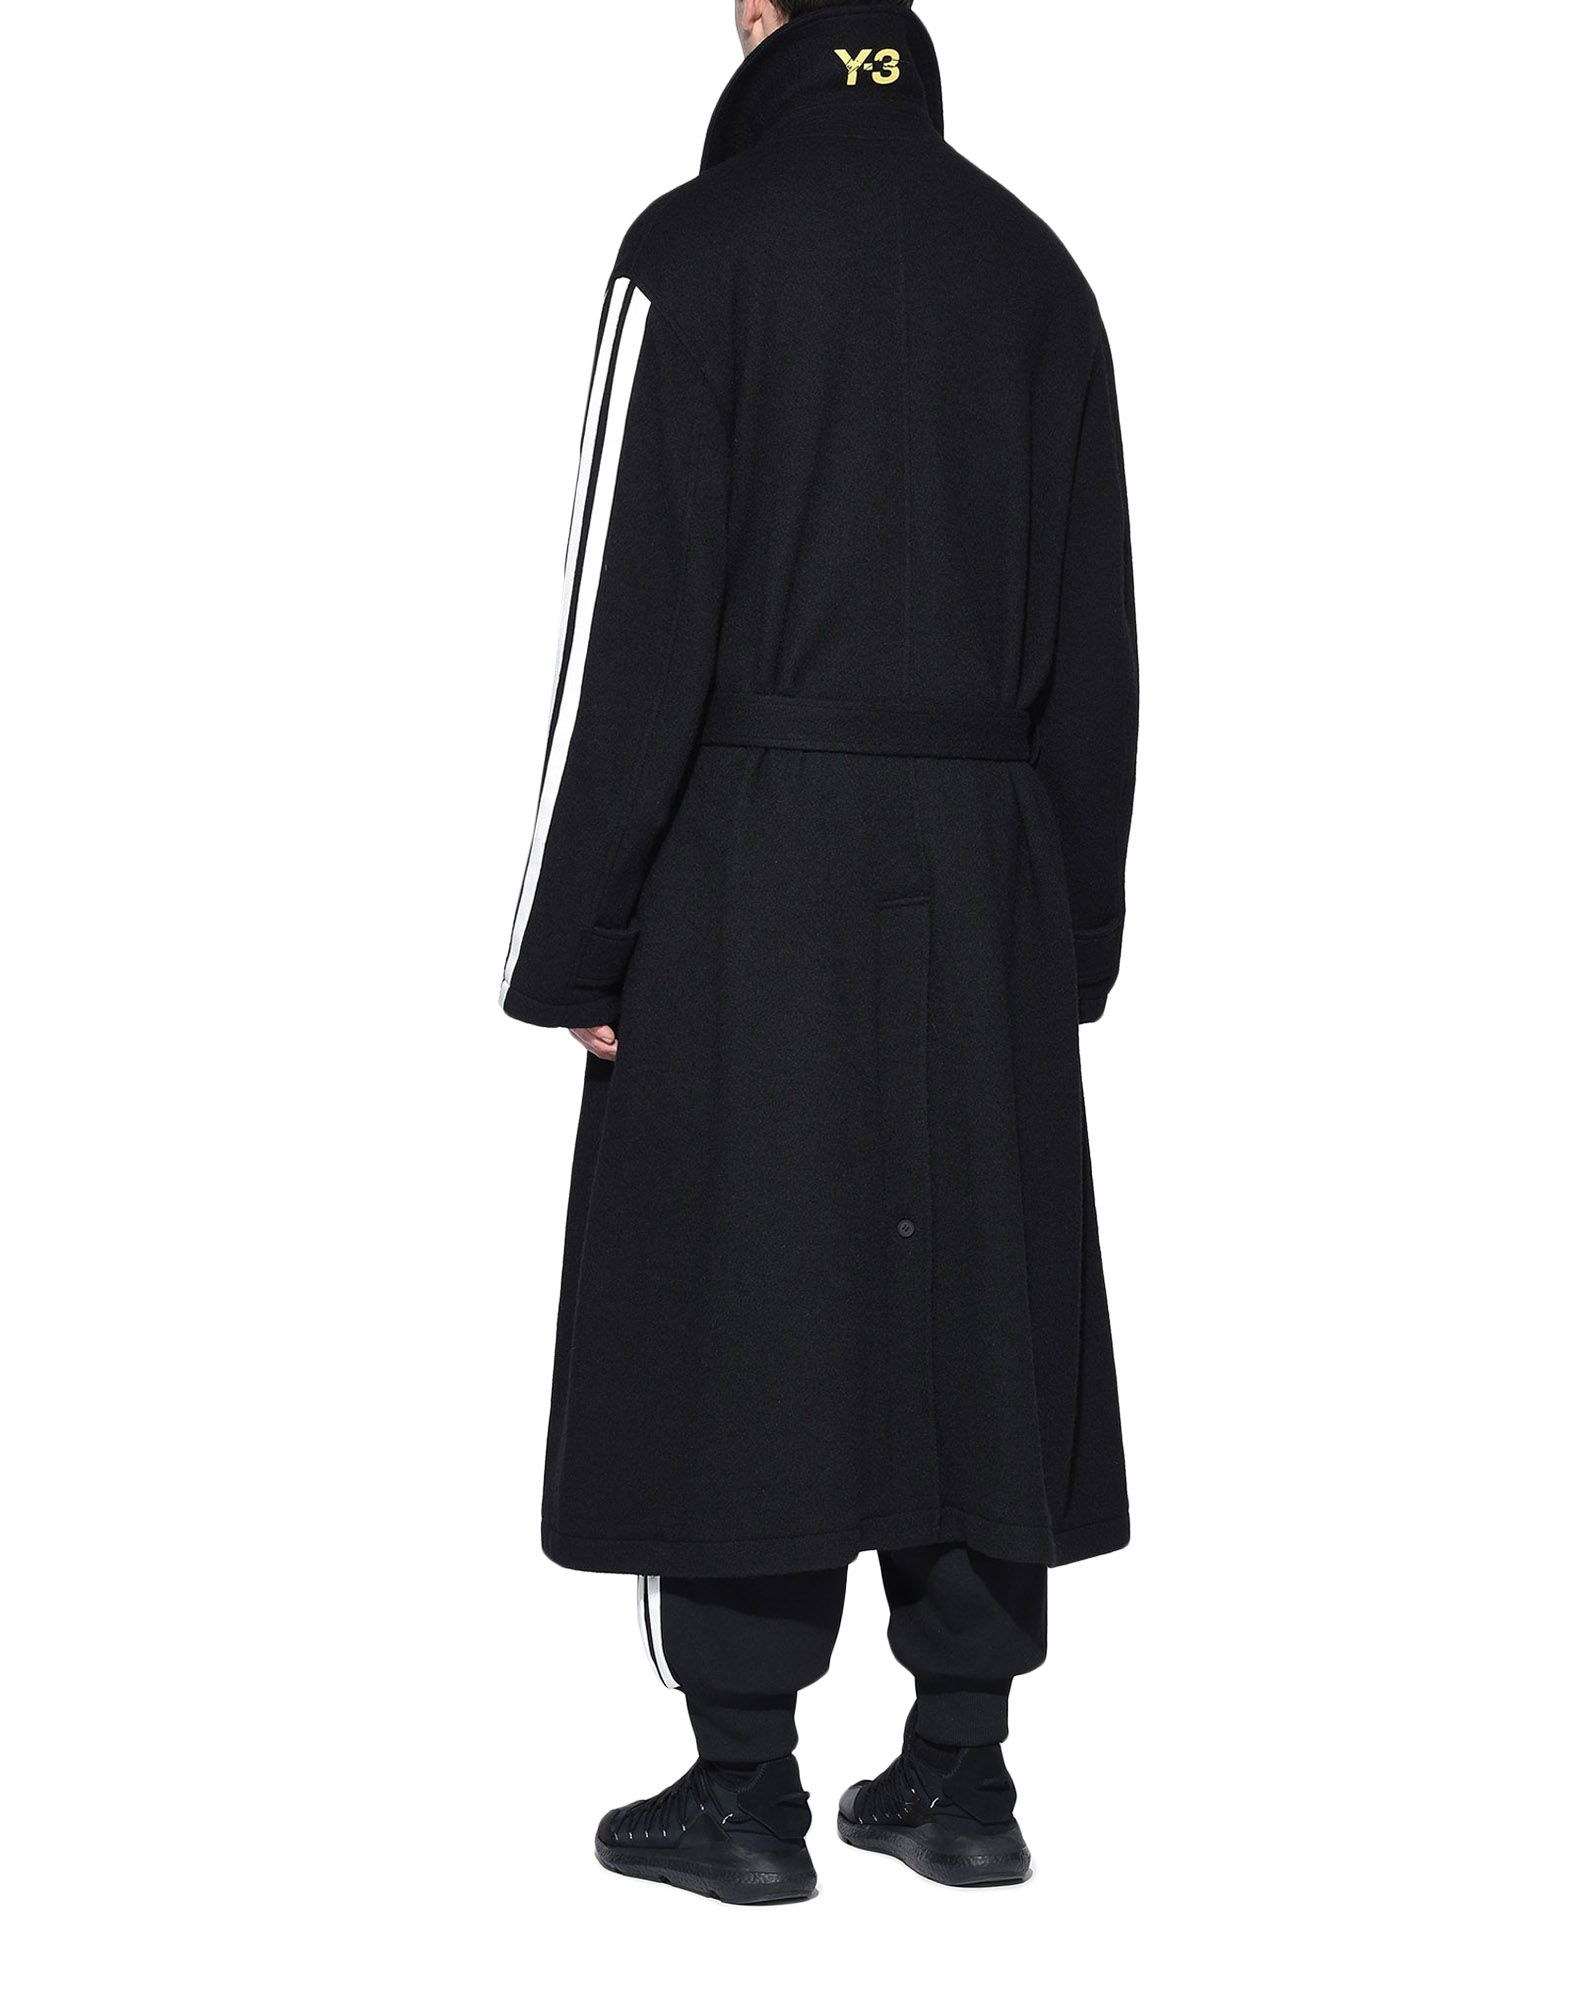 Y-3 Y-3 Tailored Wool Coat Coat Man e